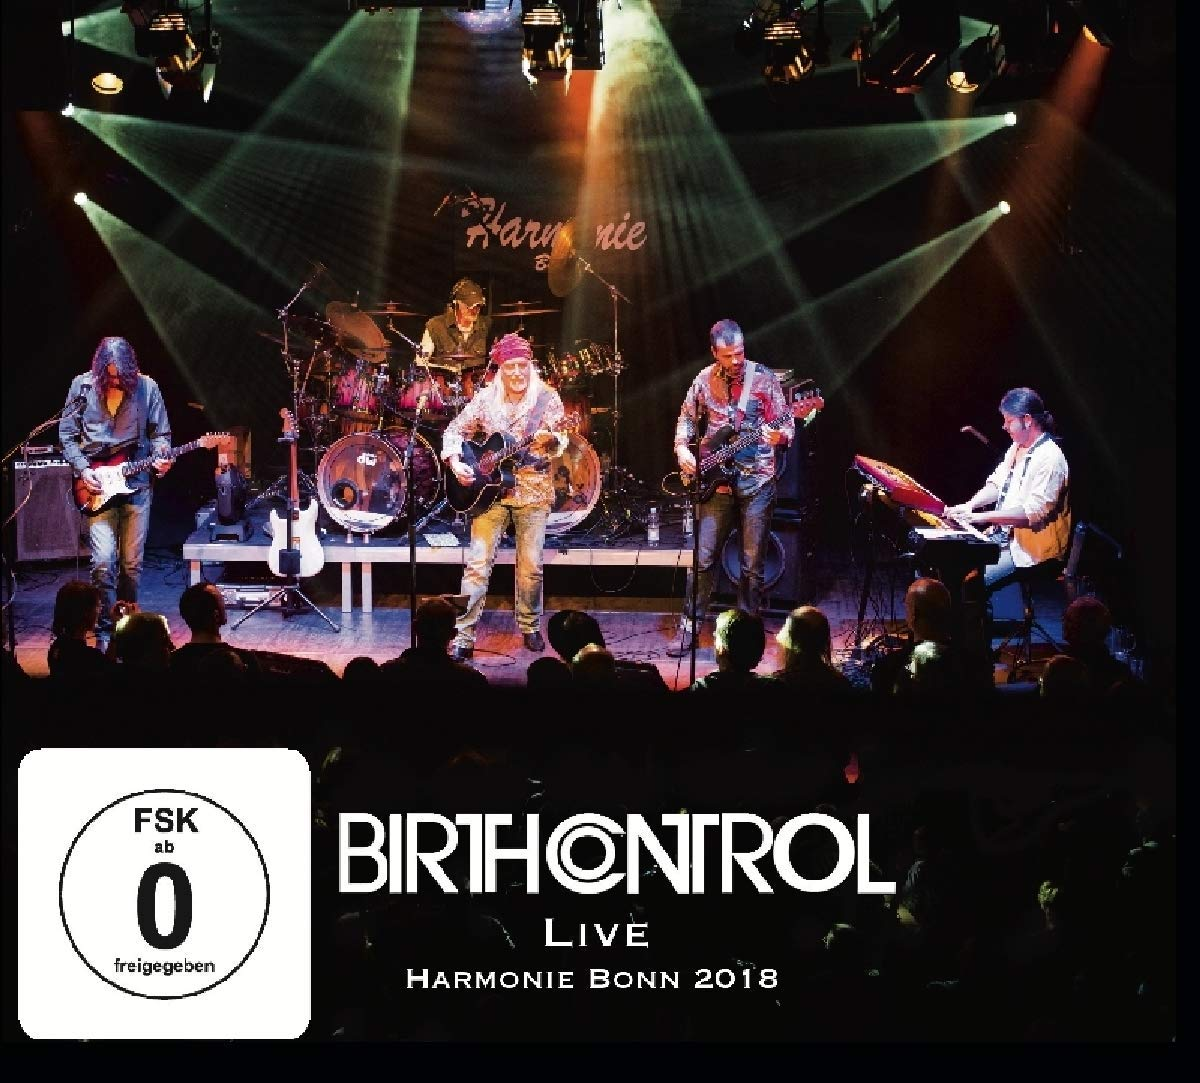 Birth Control - Live Harmonie Bonn 2018 - Album-Cover